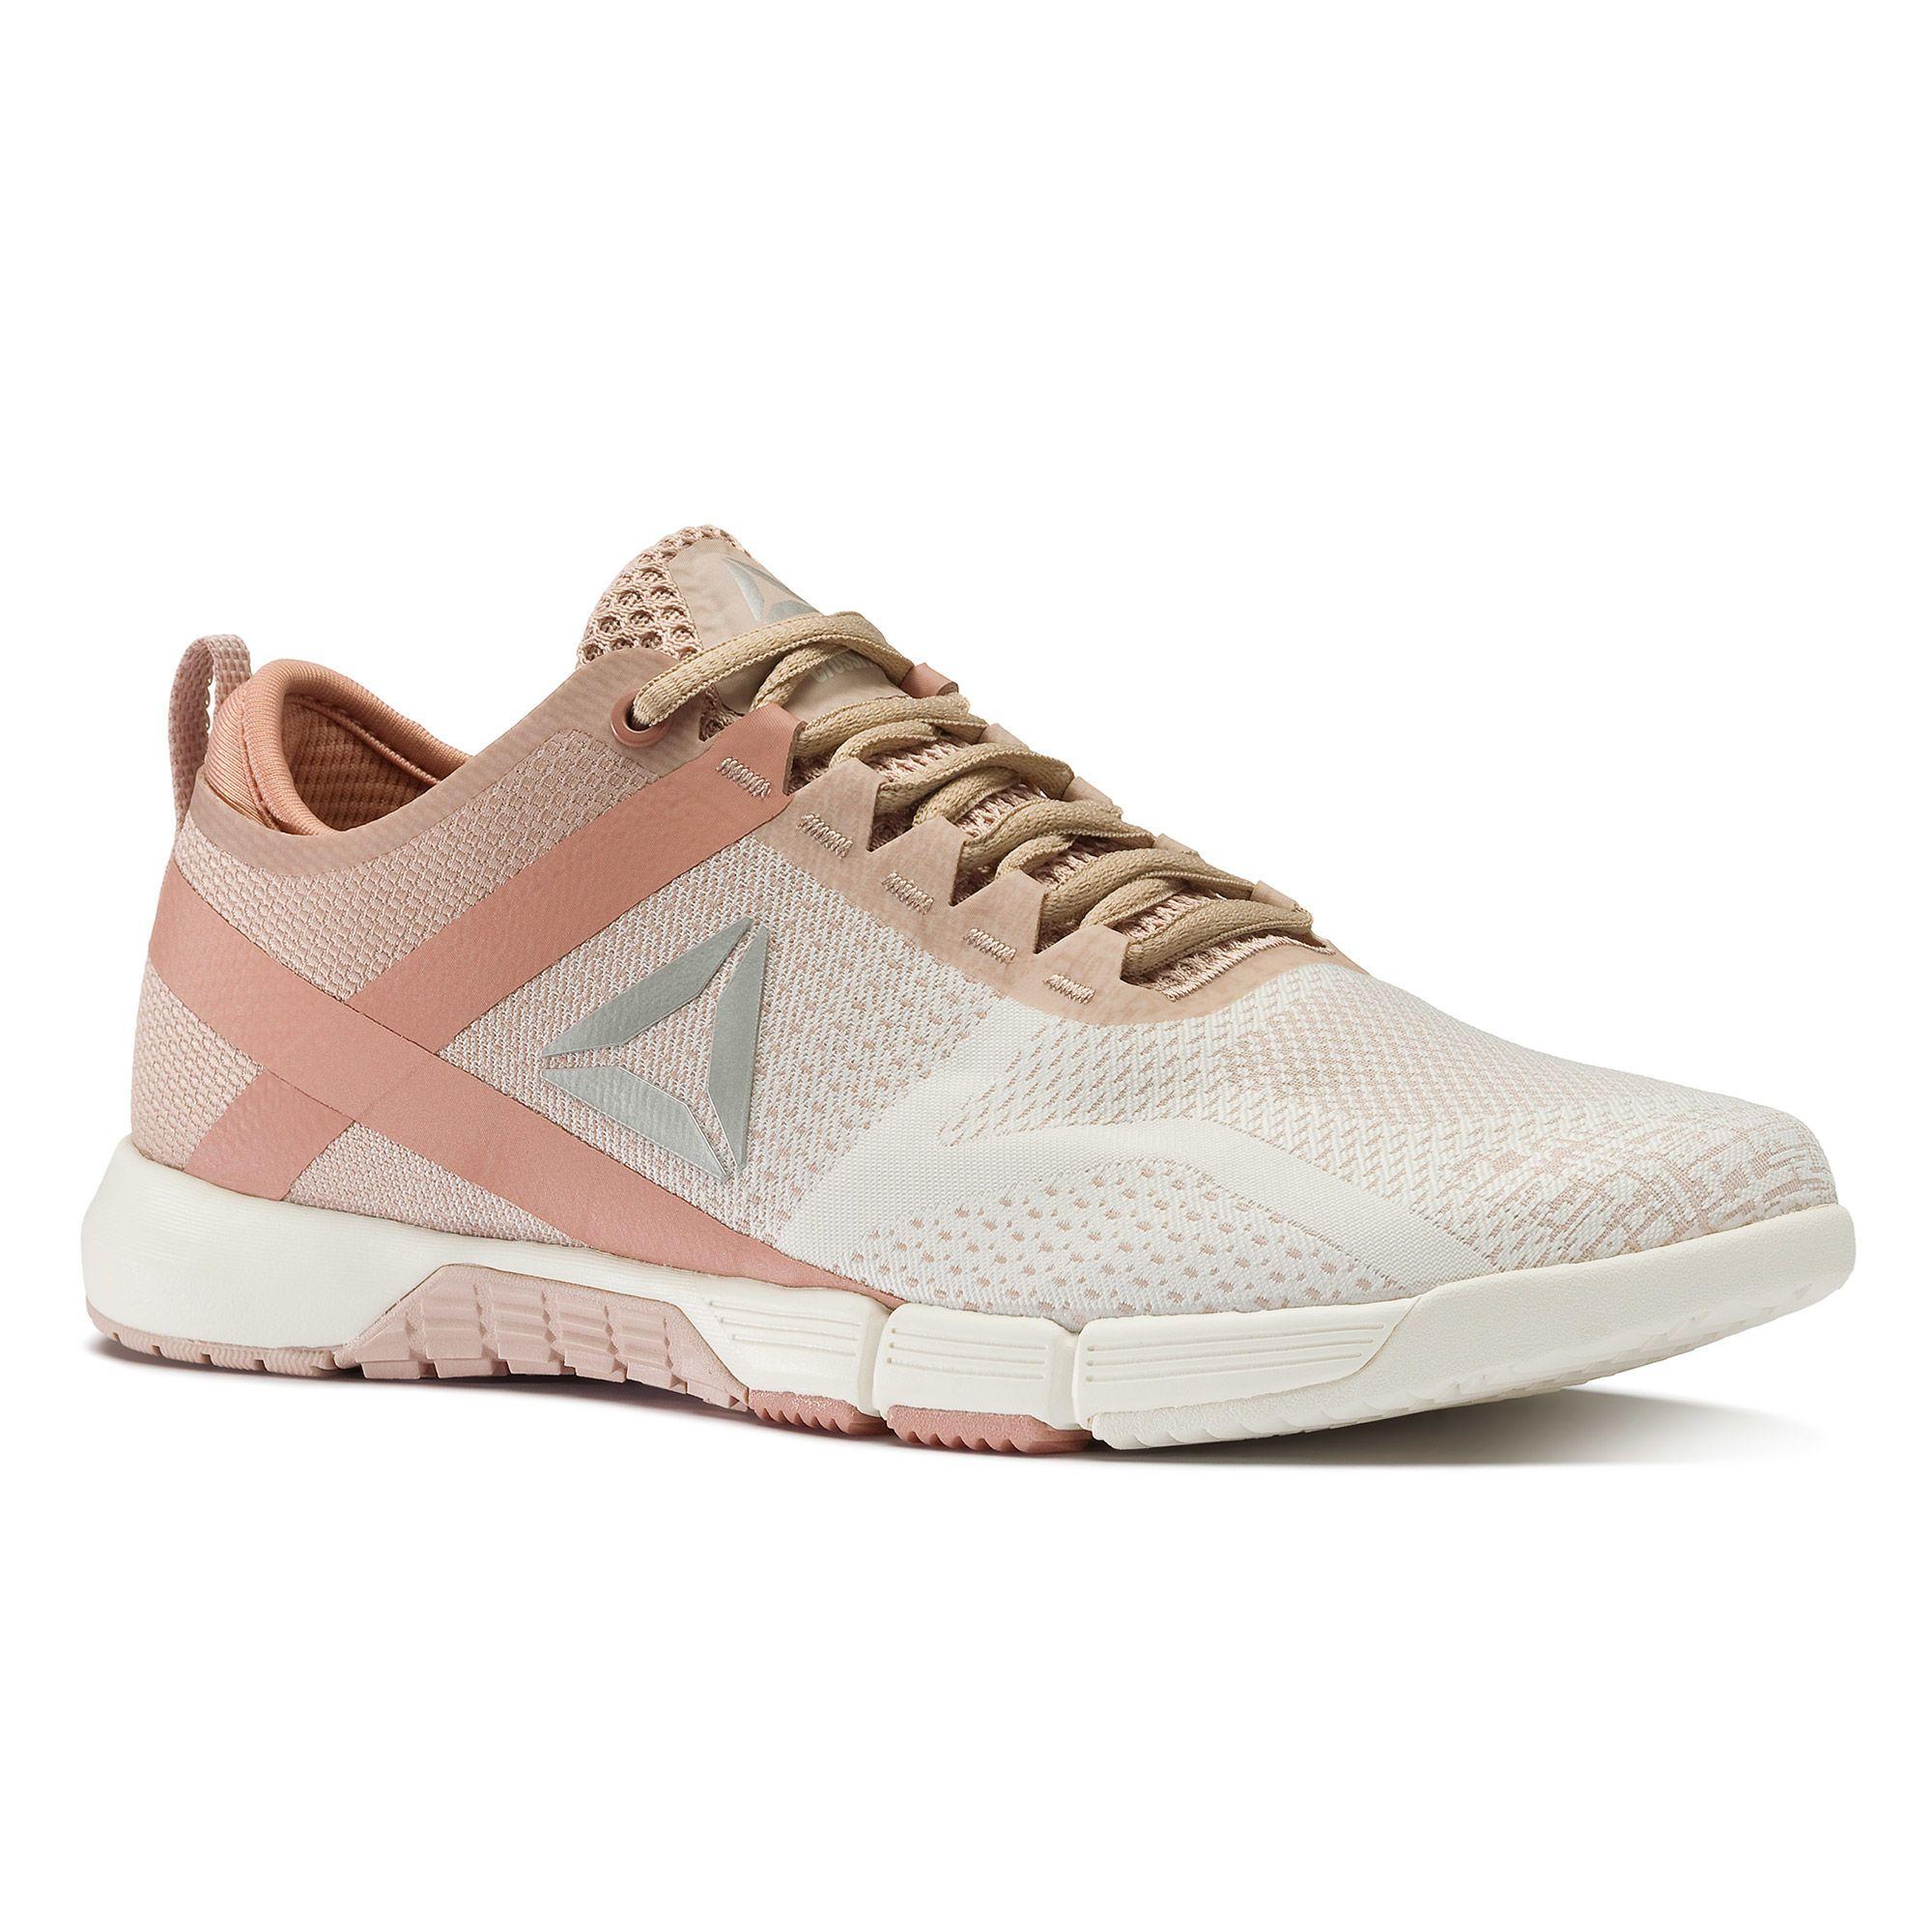 e54c899b054895 Reebok CrossFit Grace TR - Pink